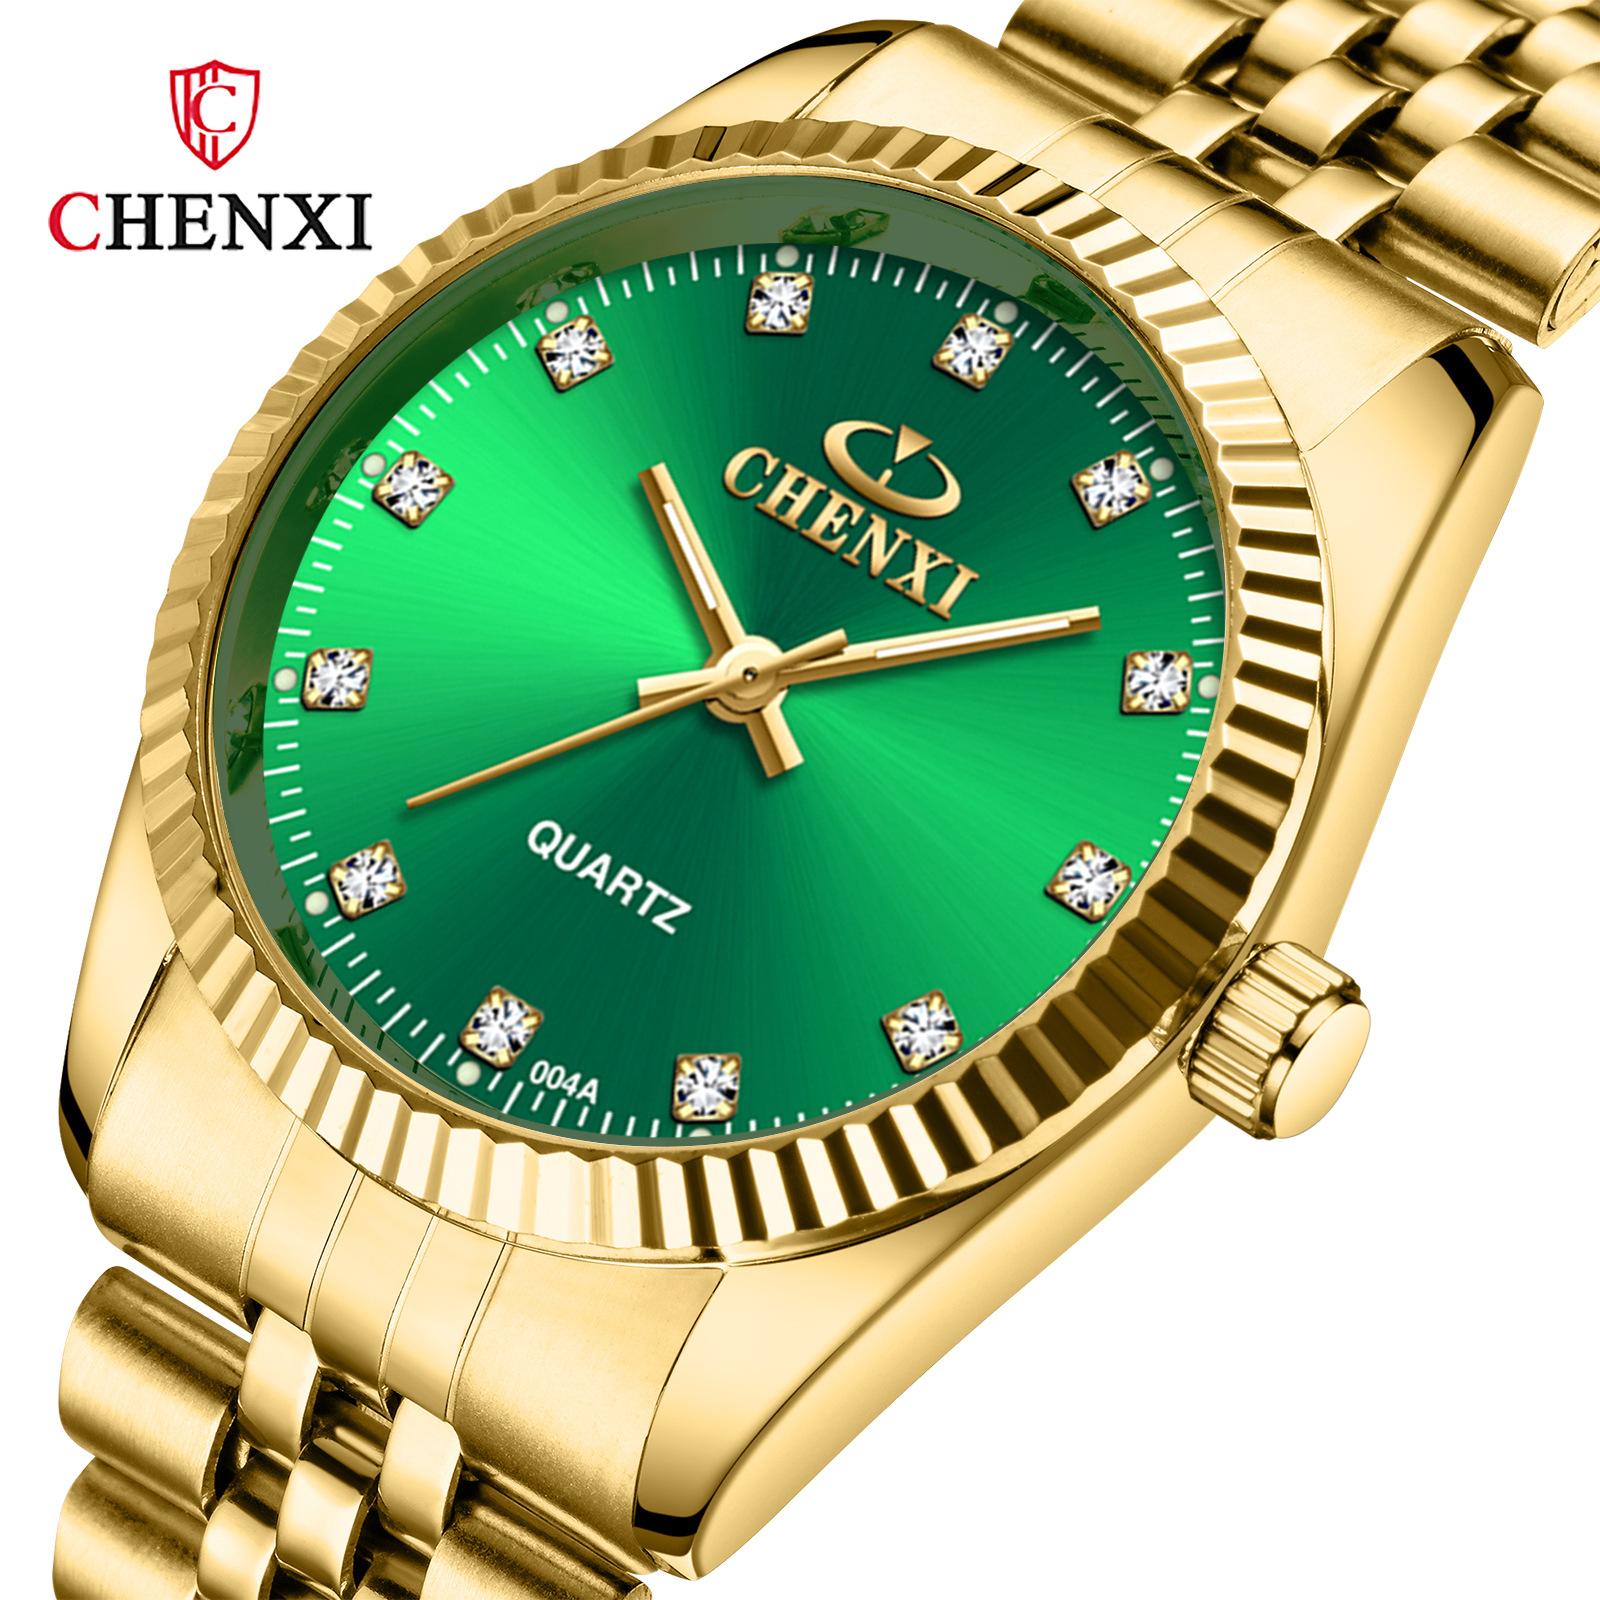 Men's Women's Watch Waterproof Business Watch Watch Cross-border Brand Watches Ms. Wholesale Gold Qing Lv Biao